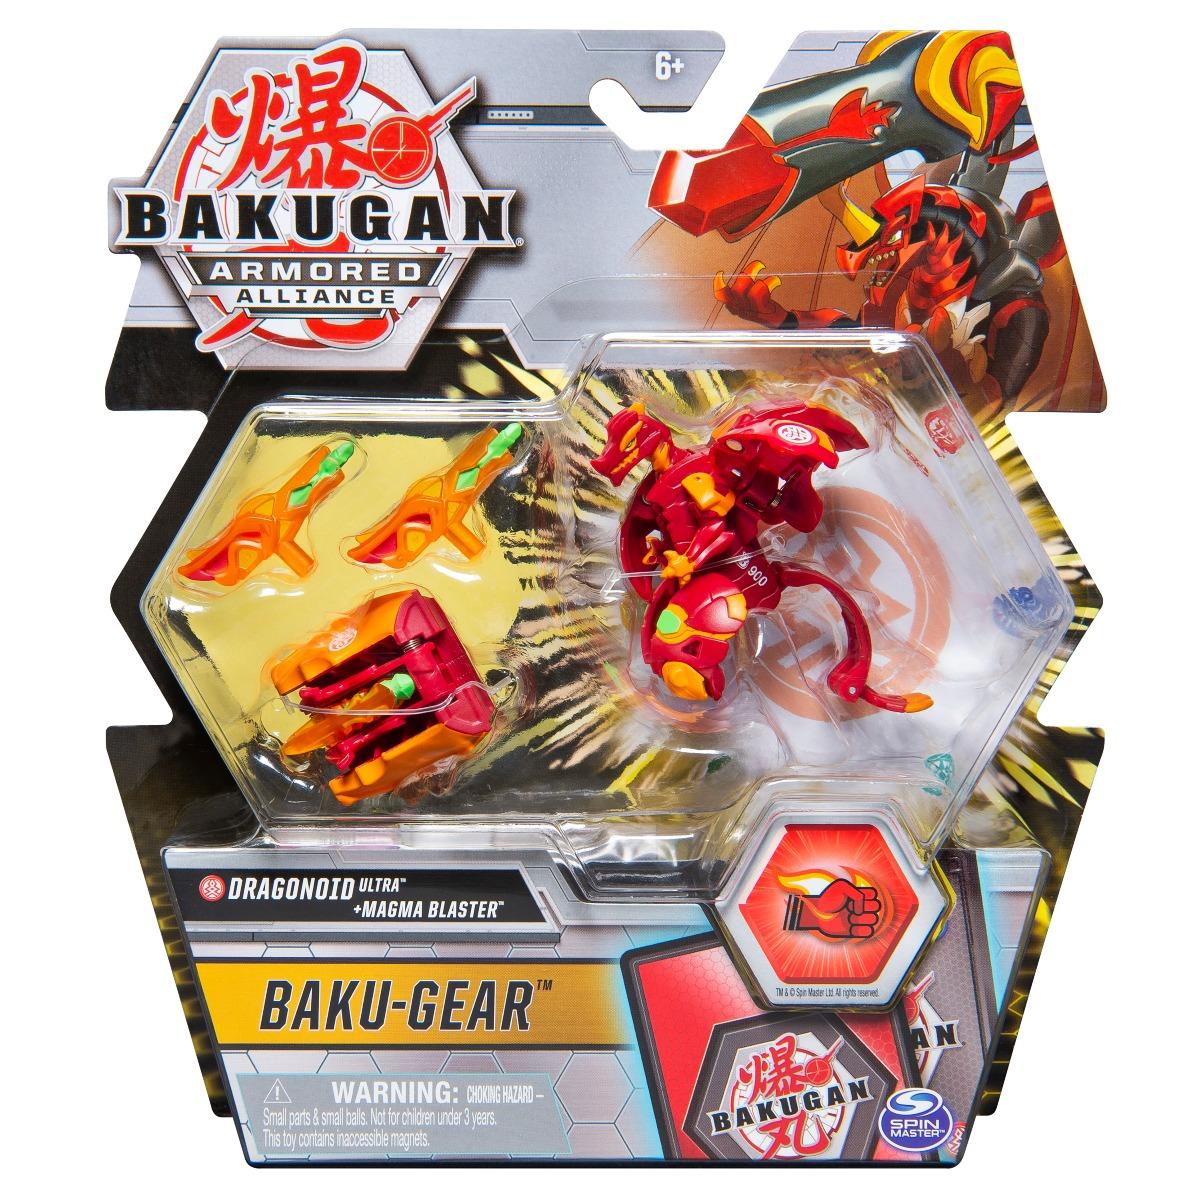 Figurina Bakugan Armored Alliance, Dragonoid Ultra, Baku-Gear 20122500